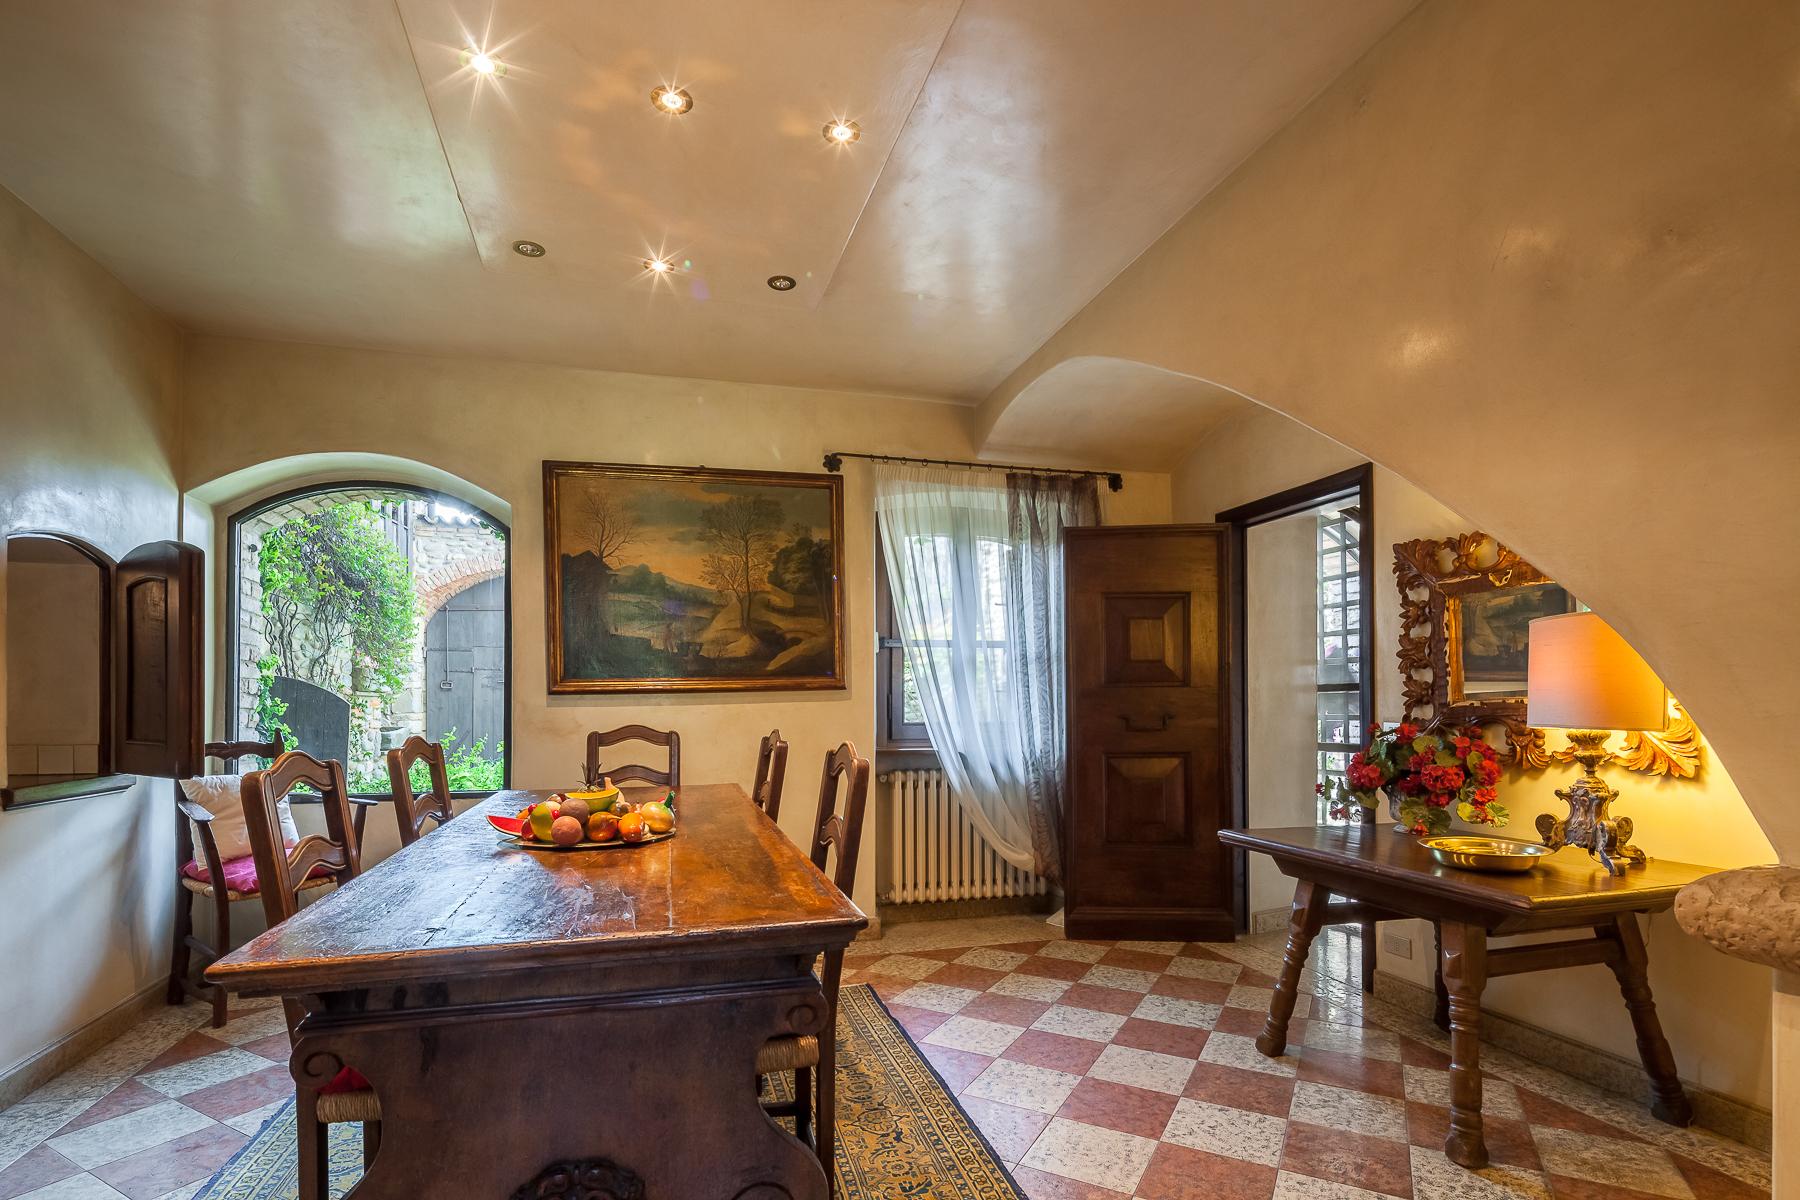 Villa in Vendita a Gorle: 5 locali, 850 mq - Foto 10